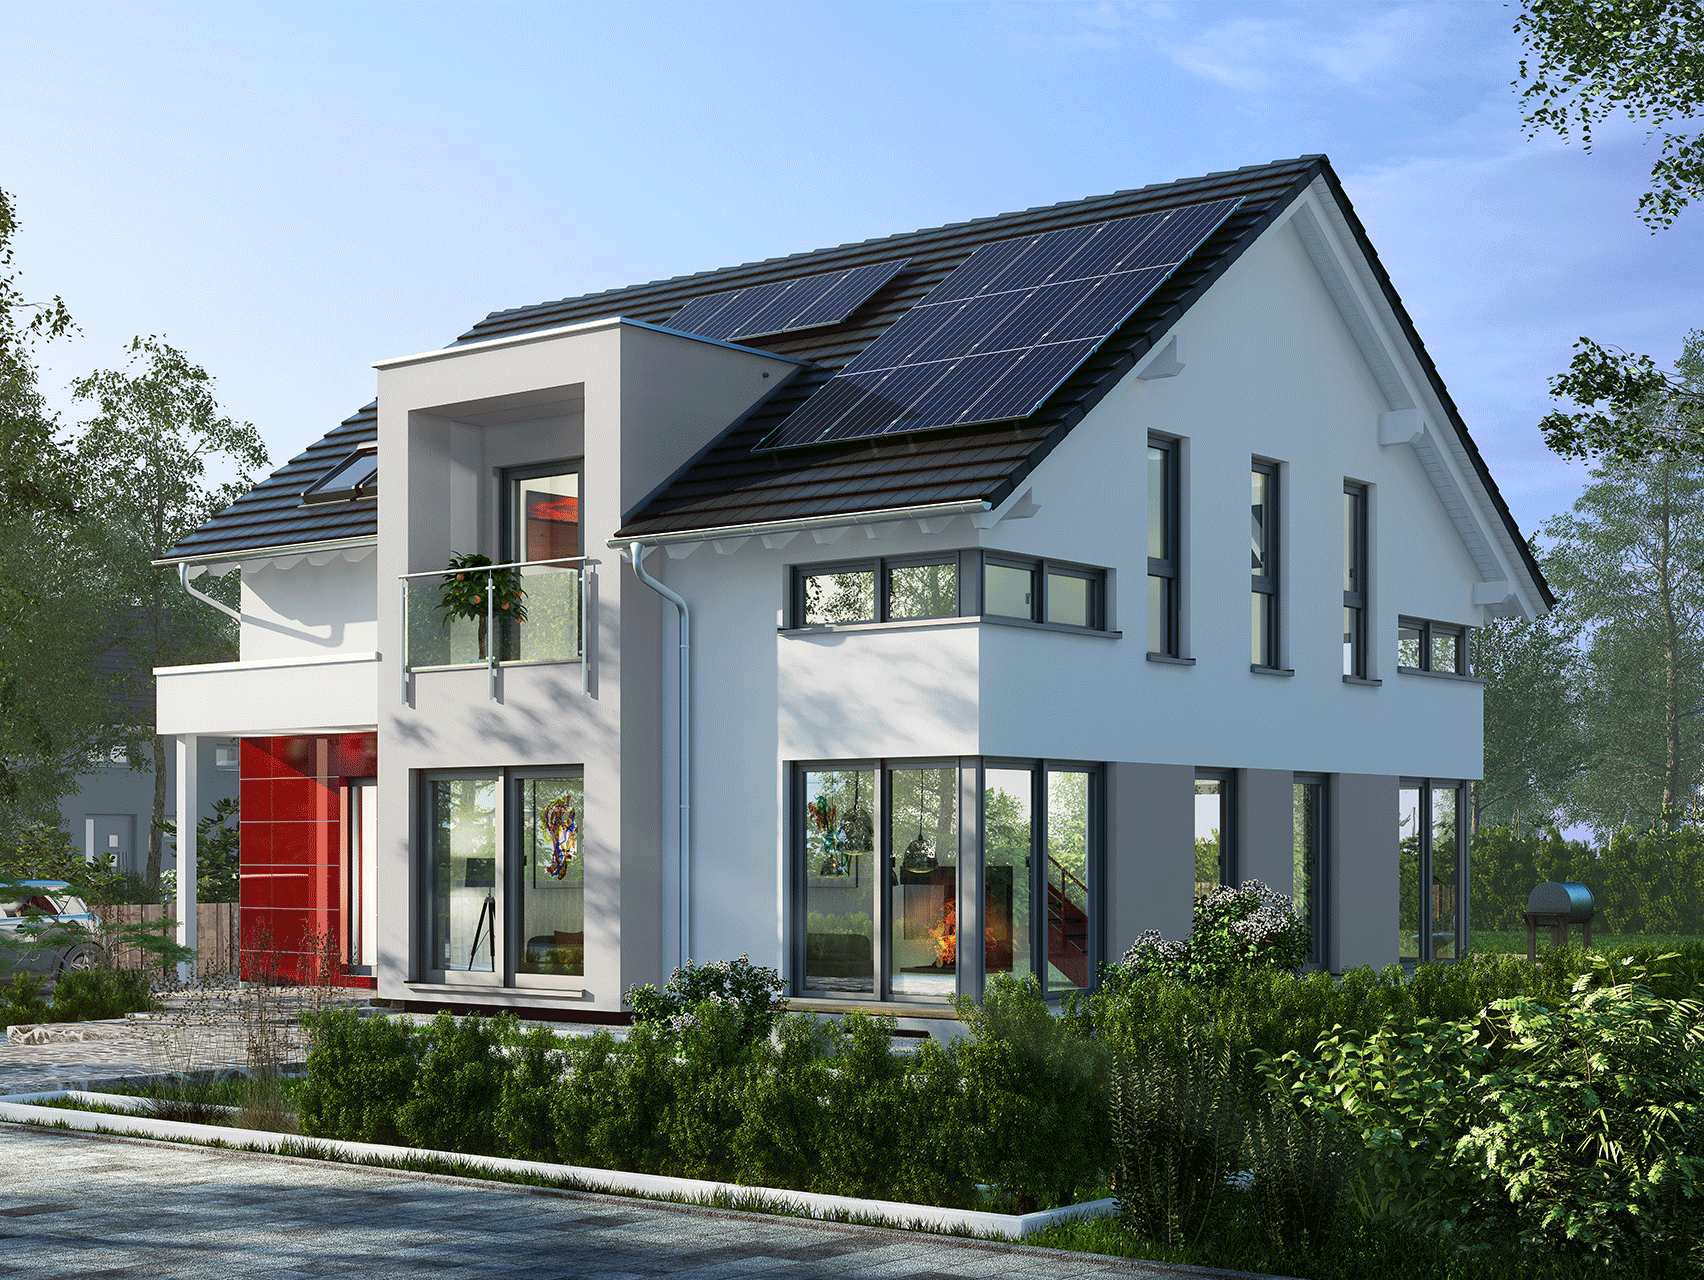 Einfamilienhaus satteldach zwerchgiebel  planungsvorschlag_MH_Fellbach_43_9sp_1704x1280.png